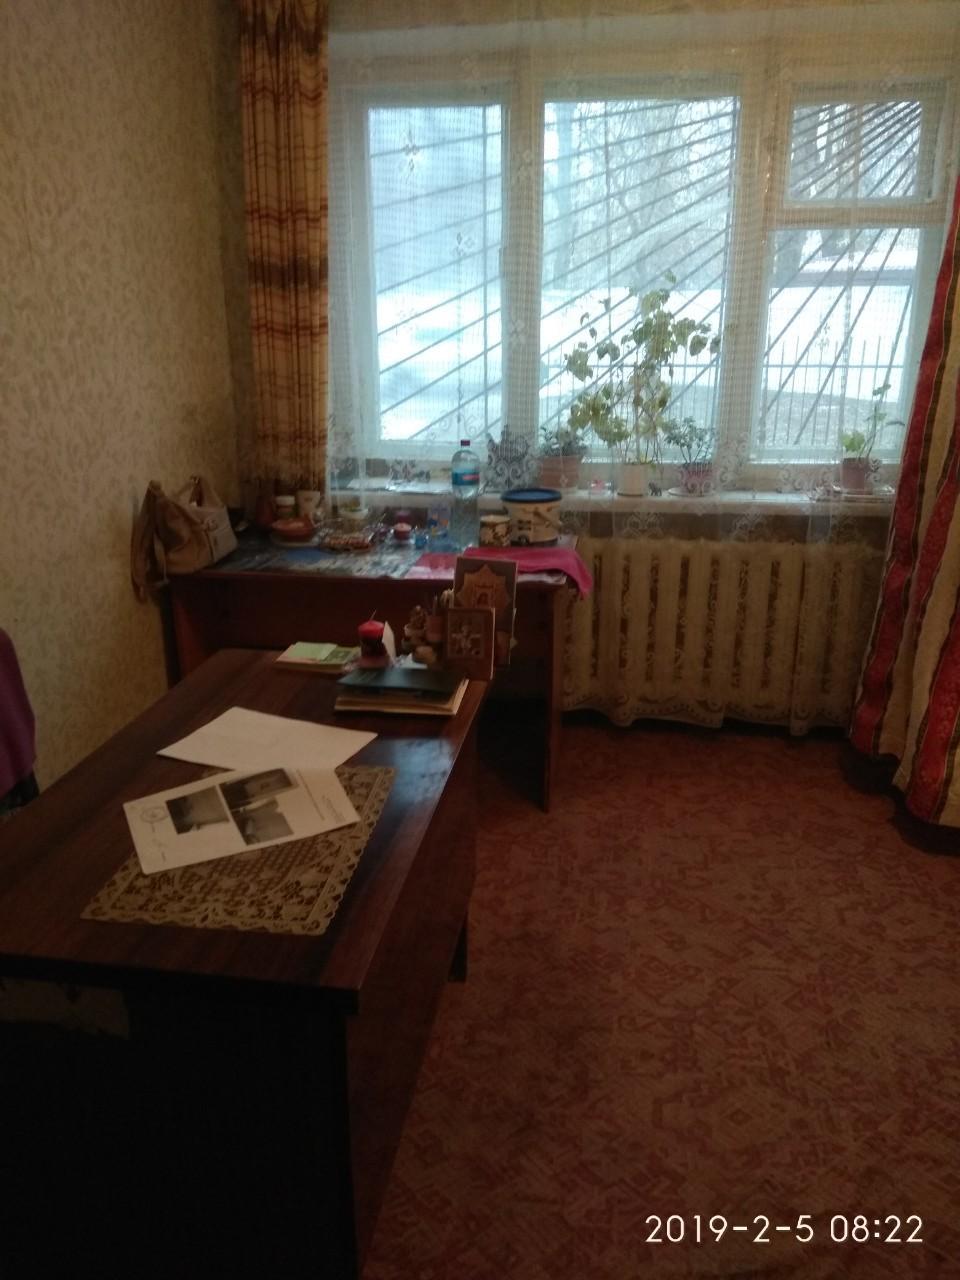 Нежитлове приміщення 1-го поверху, площею 14,0 кв.м, м, Бровари